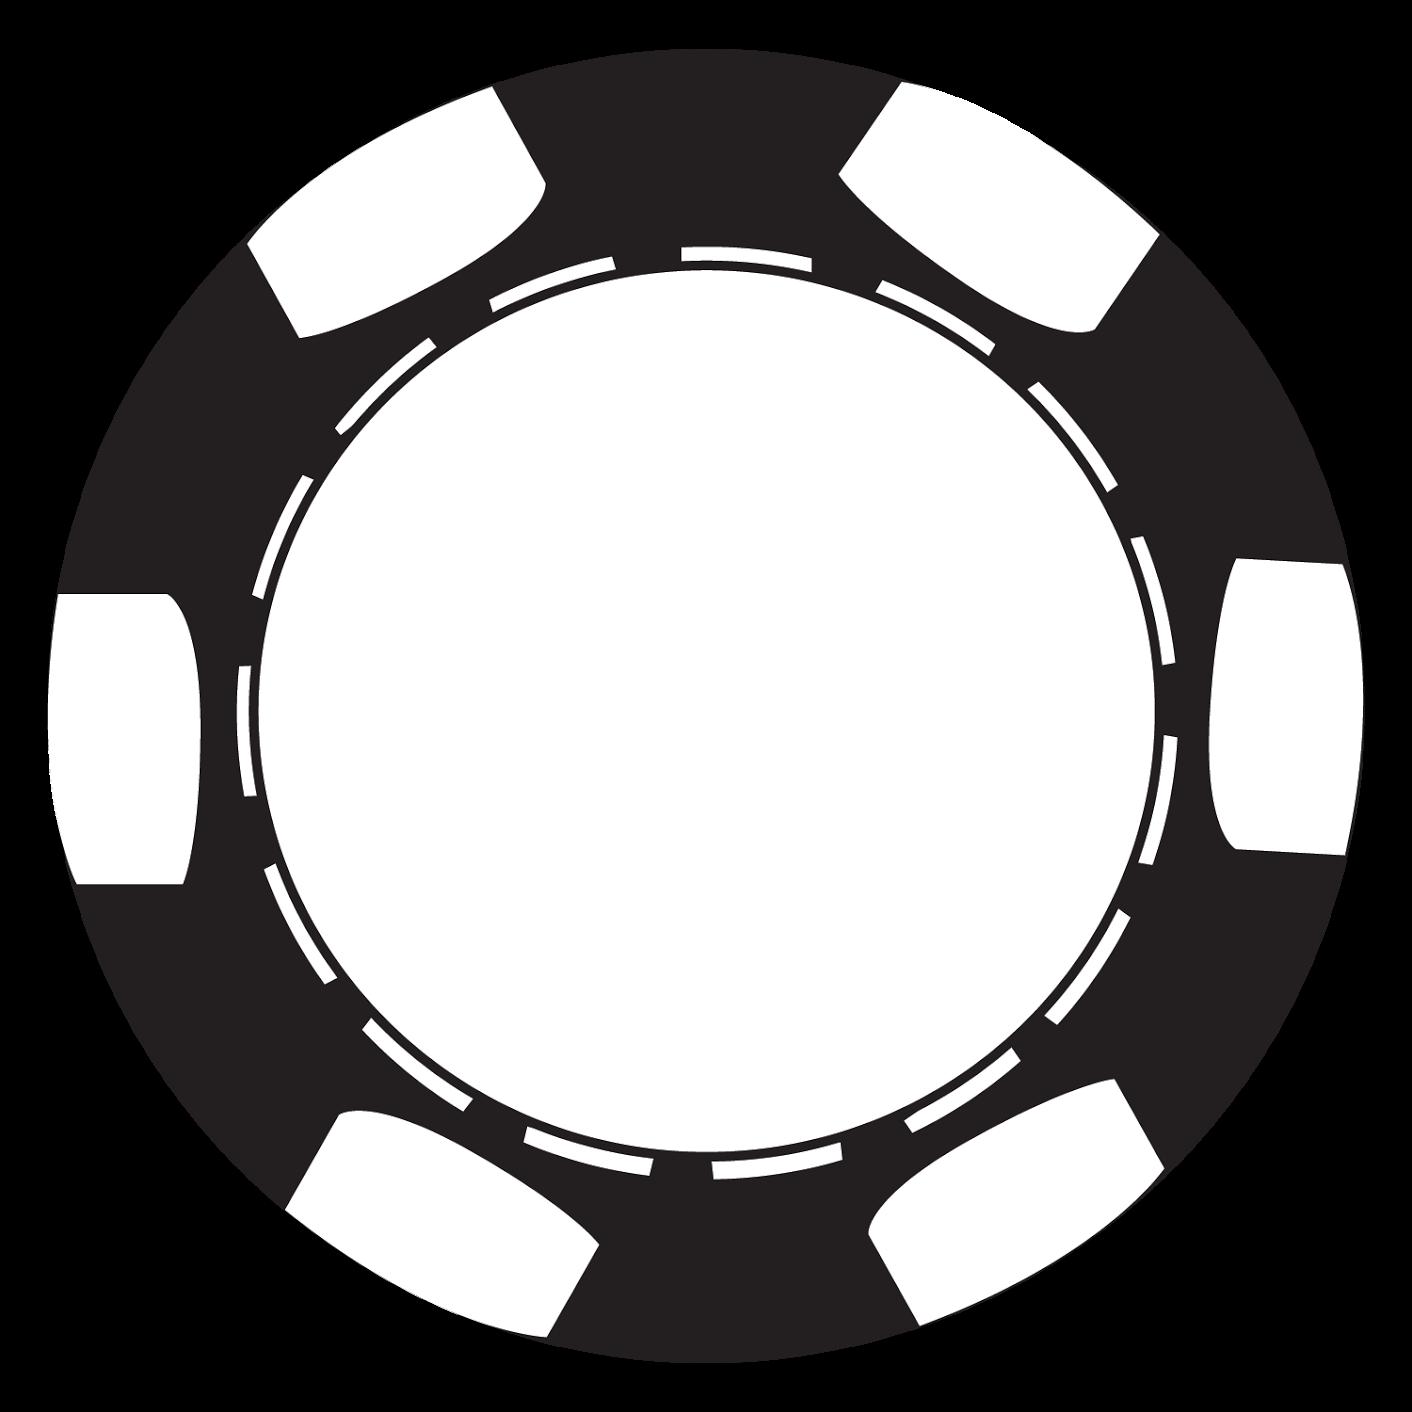 Design custom poker chips. Chip clipart transparent background